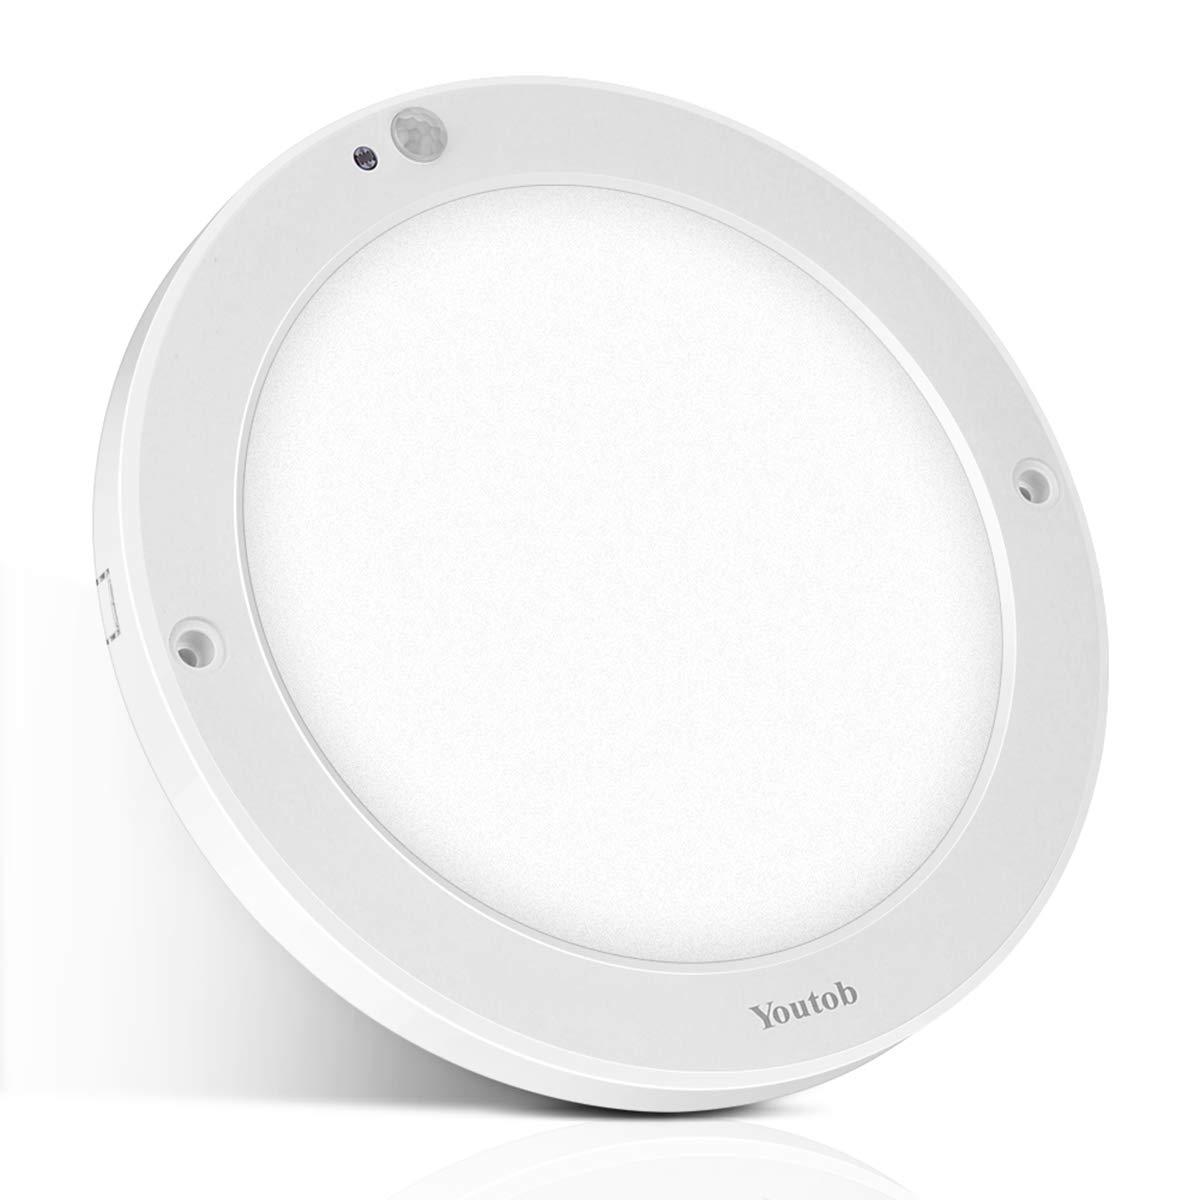 Youtob Motion Sensor LED Ceiling Light, 100 Watt Equivalent, for Indoor/Outdoor, Stairs, Closet Room, Basement, Hallway [Latest Upgrade Version]